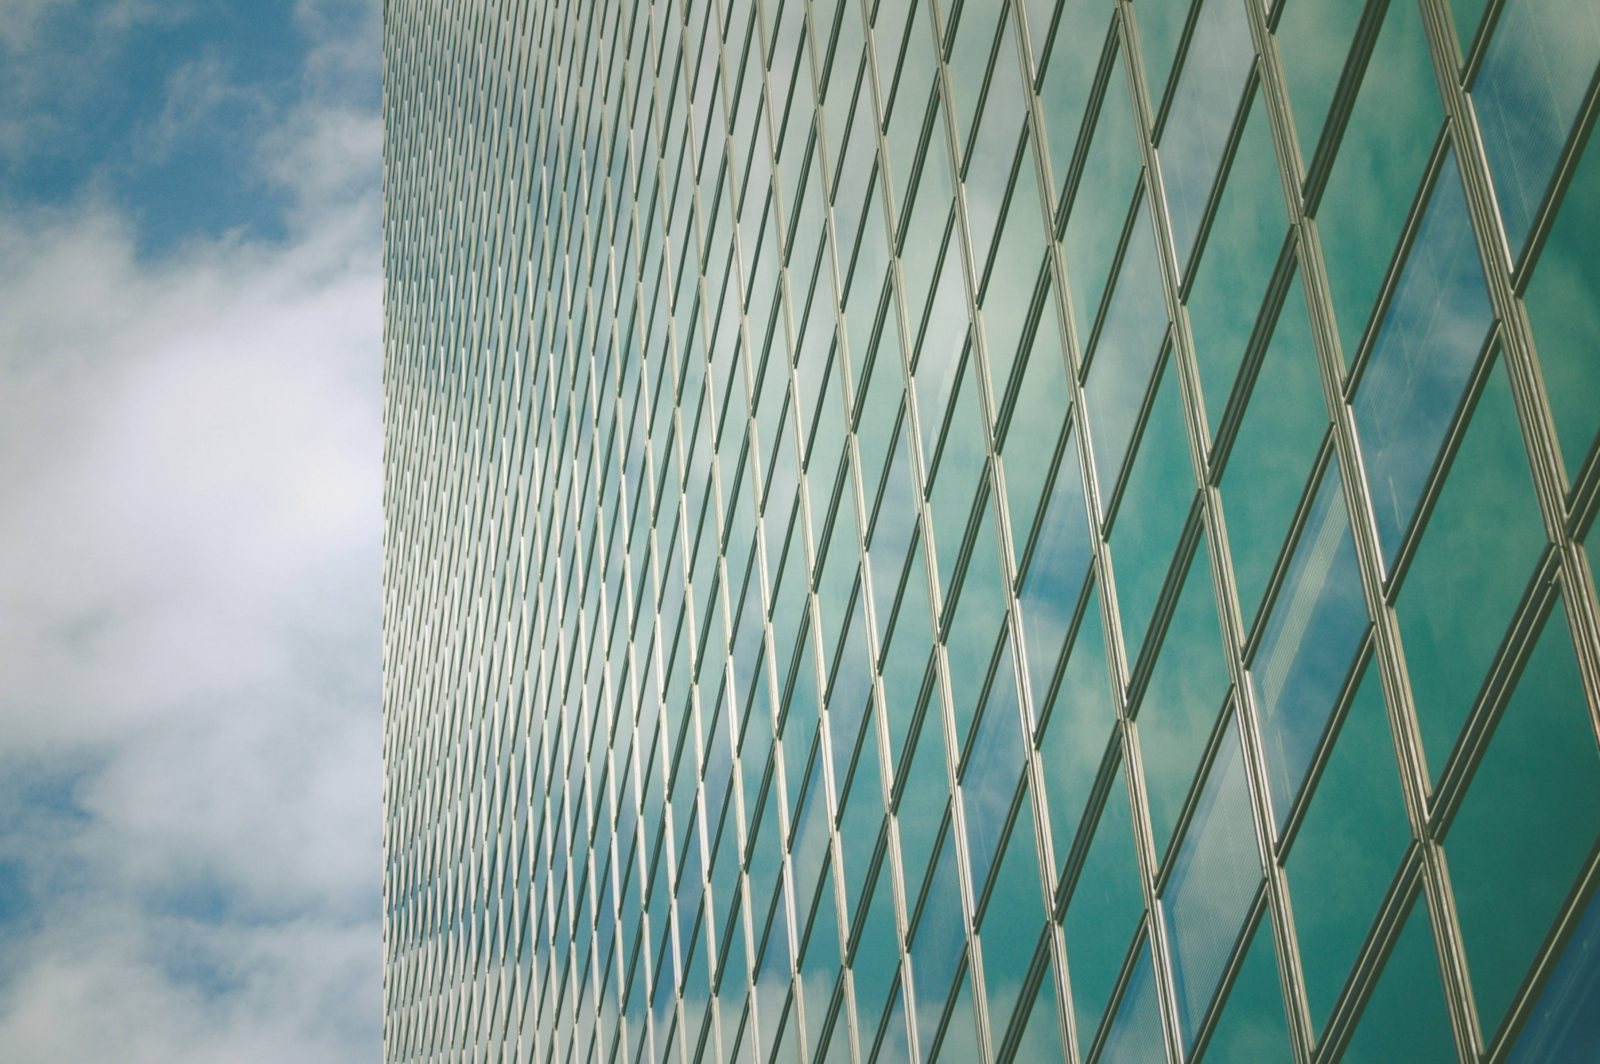 Skyscraper windows pattern The Hague